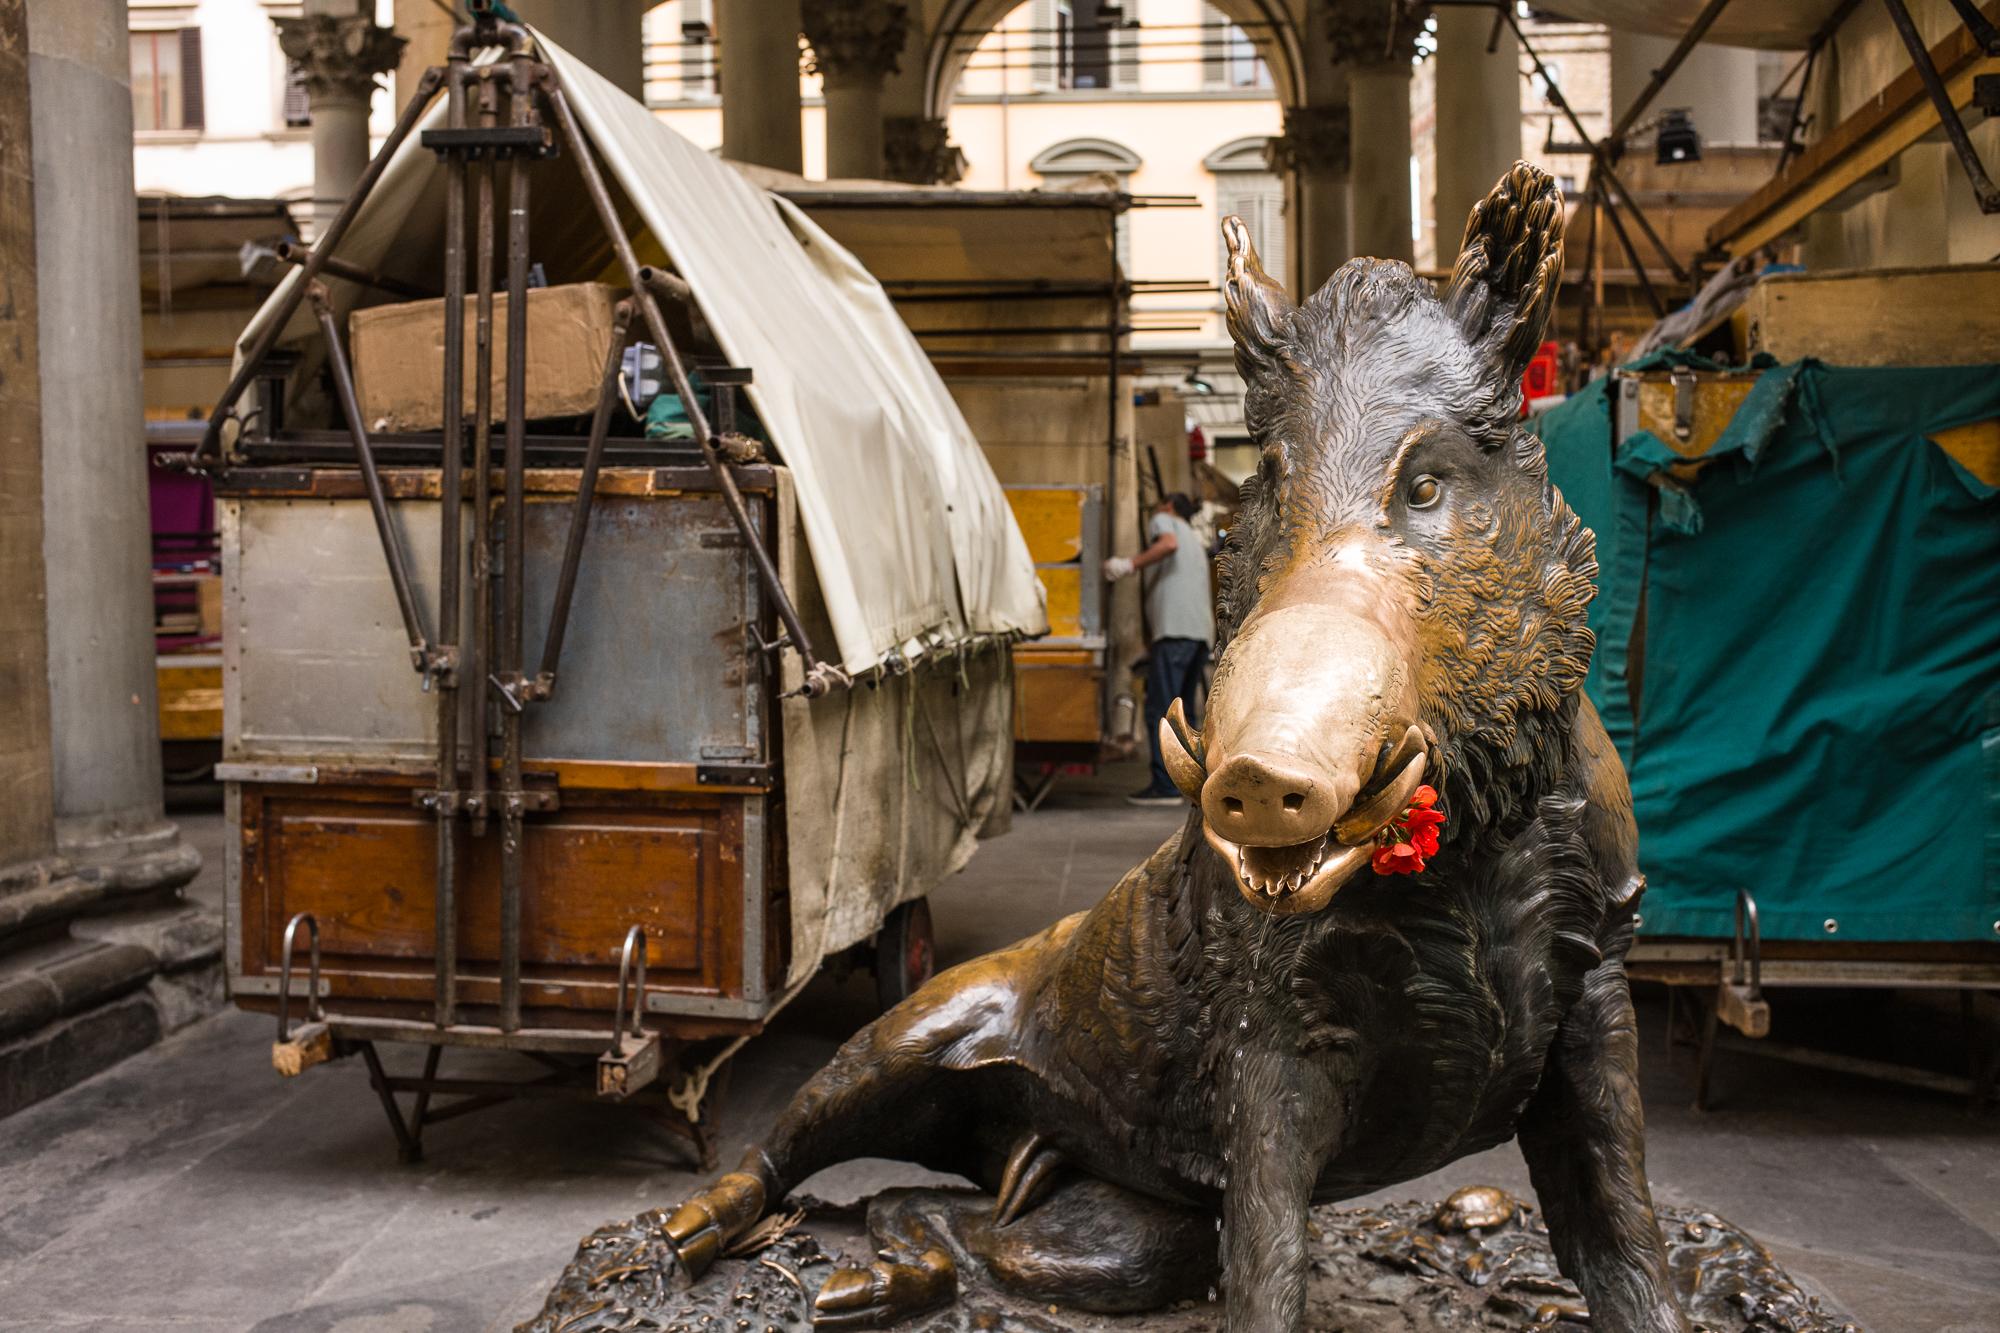 Boar sculpture in Florence